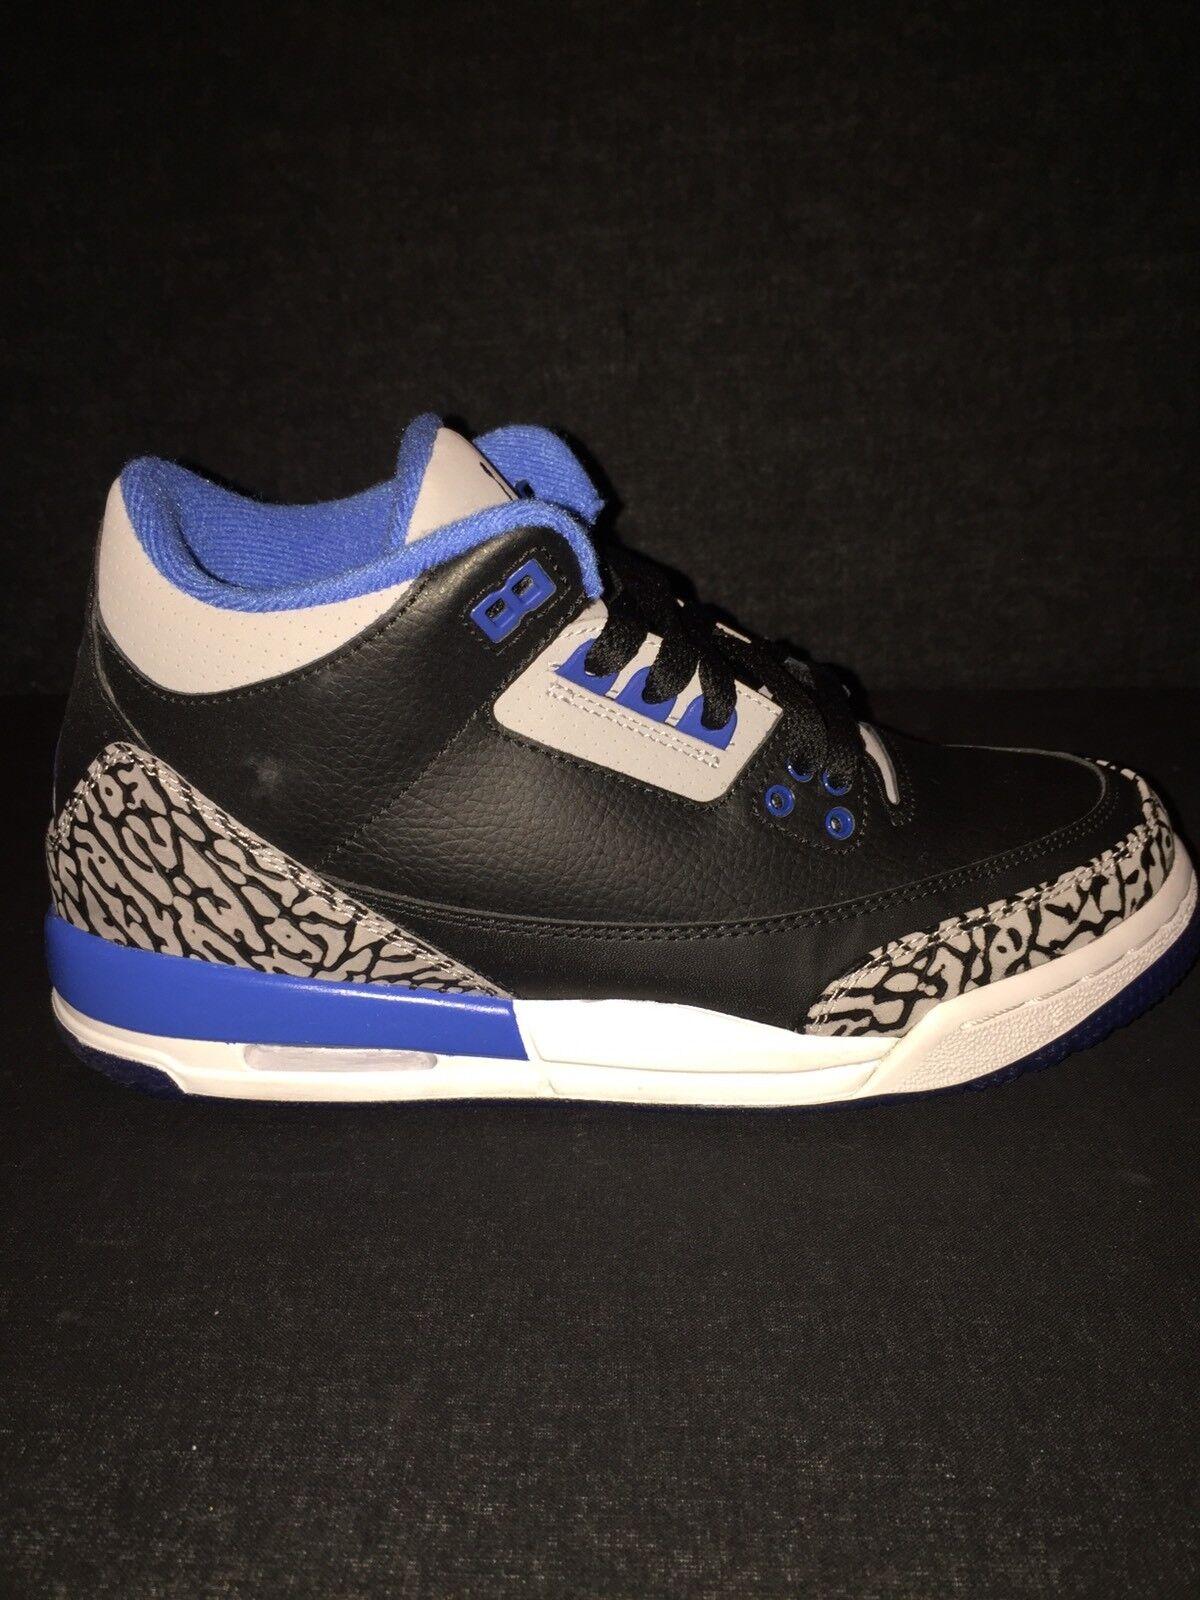 Nike air jordan retr og sport azzurro sei dimensioni 6 rara mila bambini og cassa rara 6 indossato una volta 7022ab